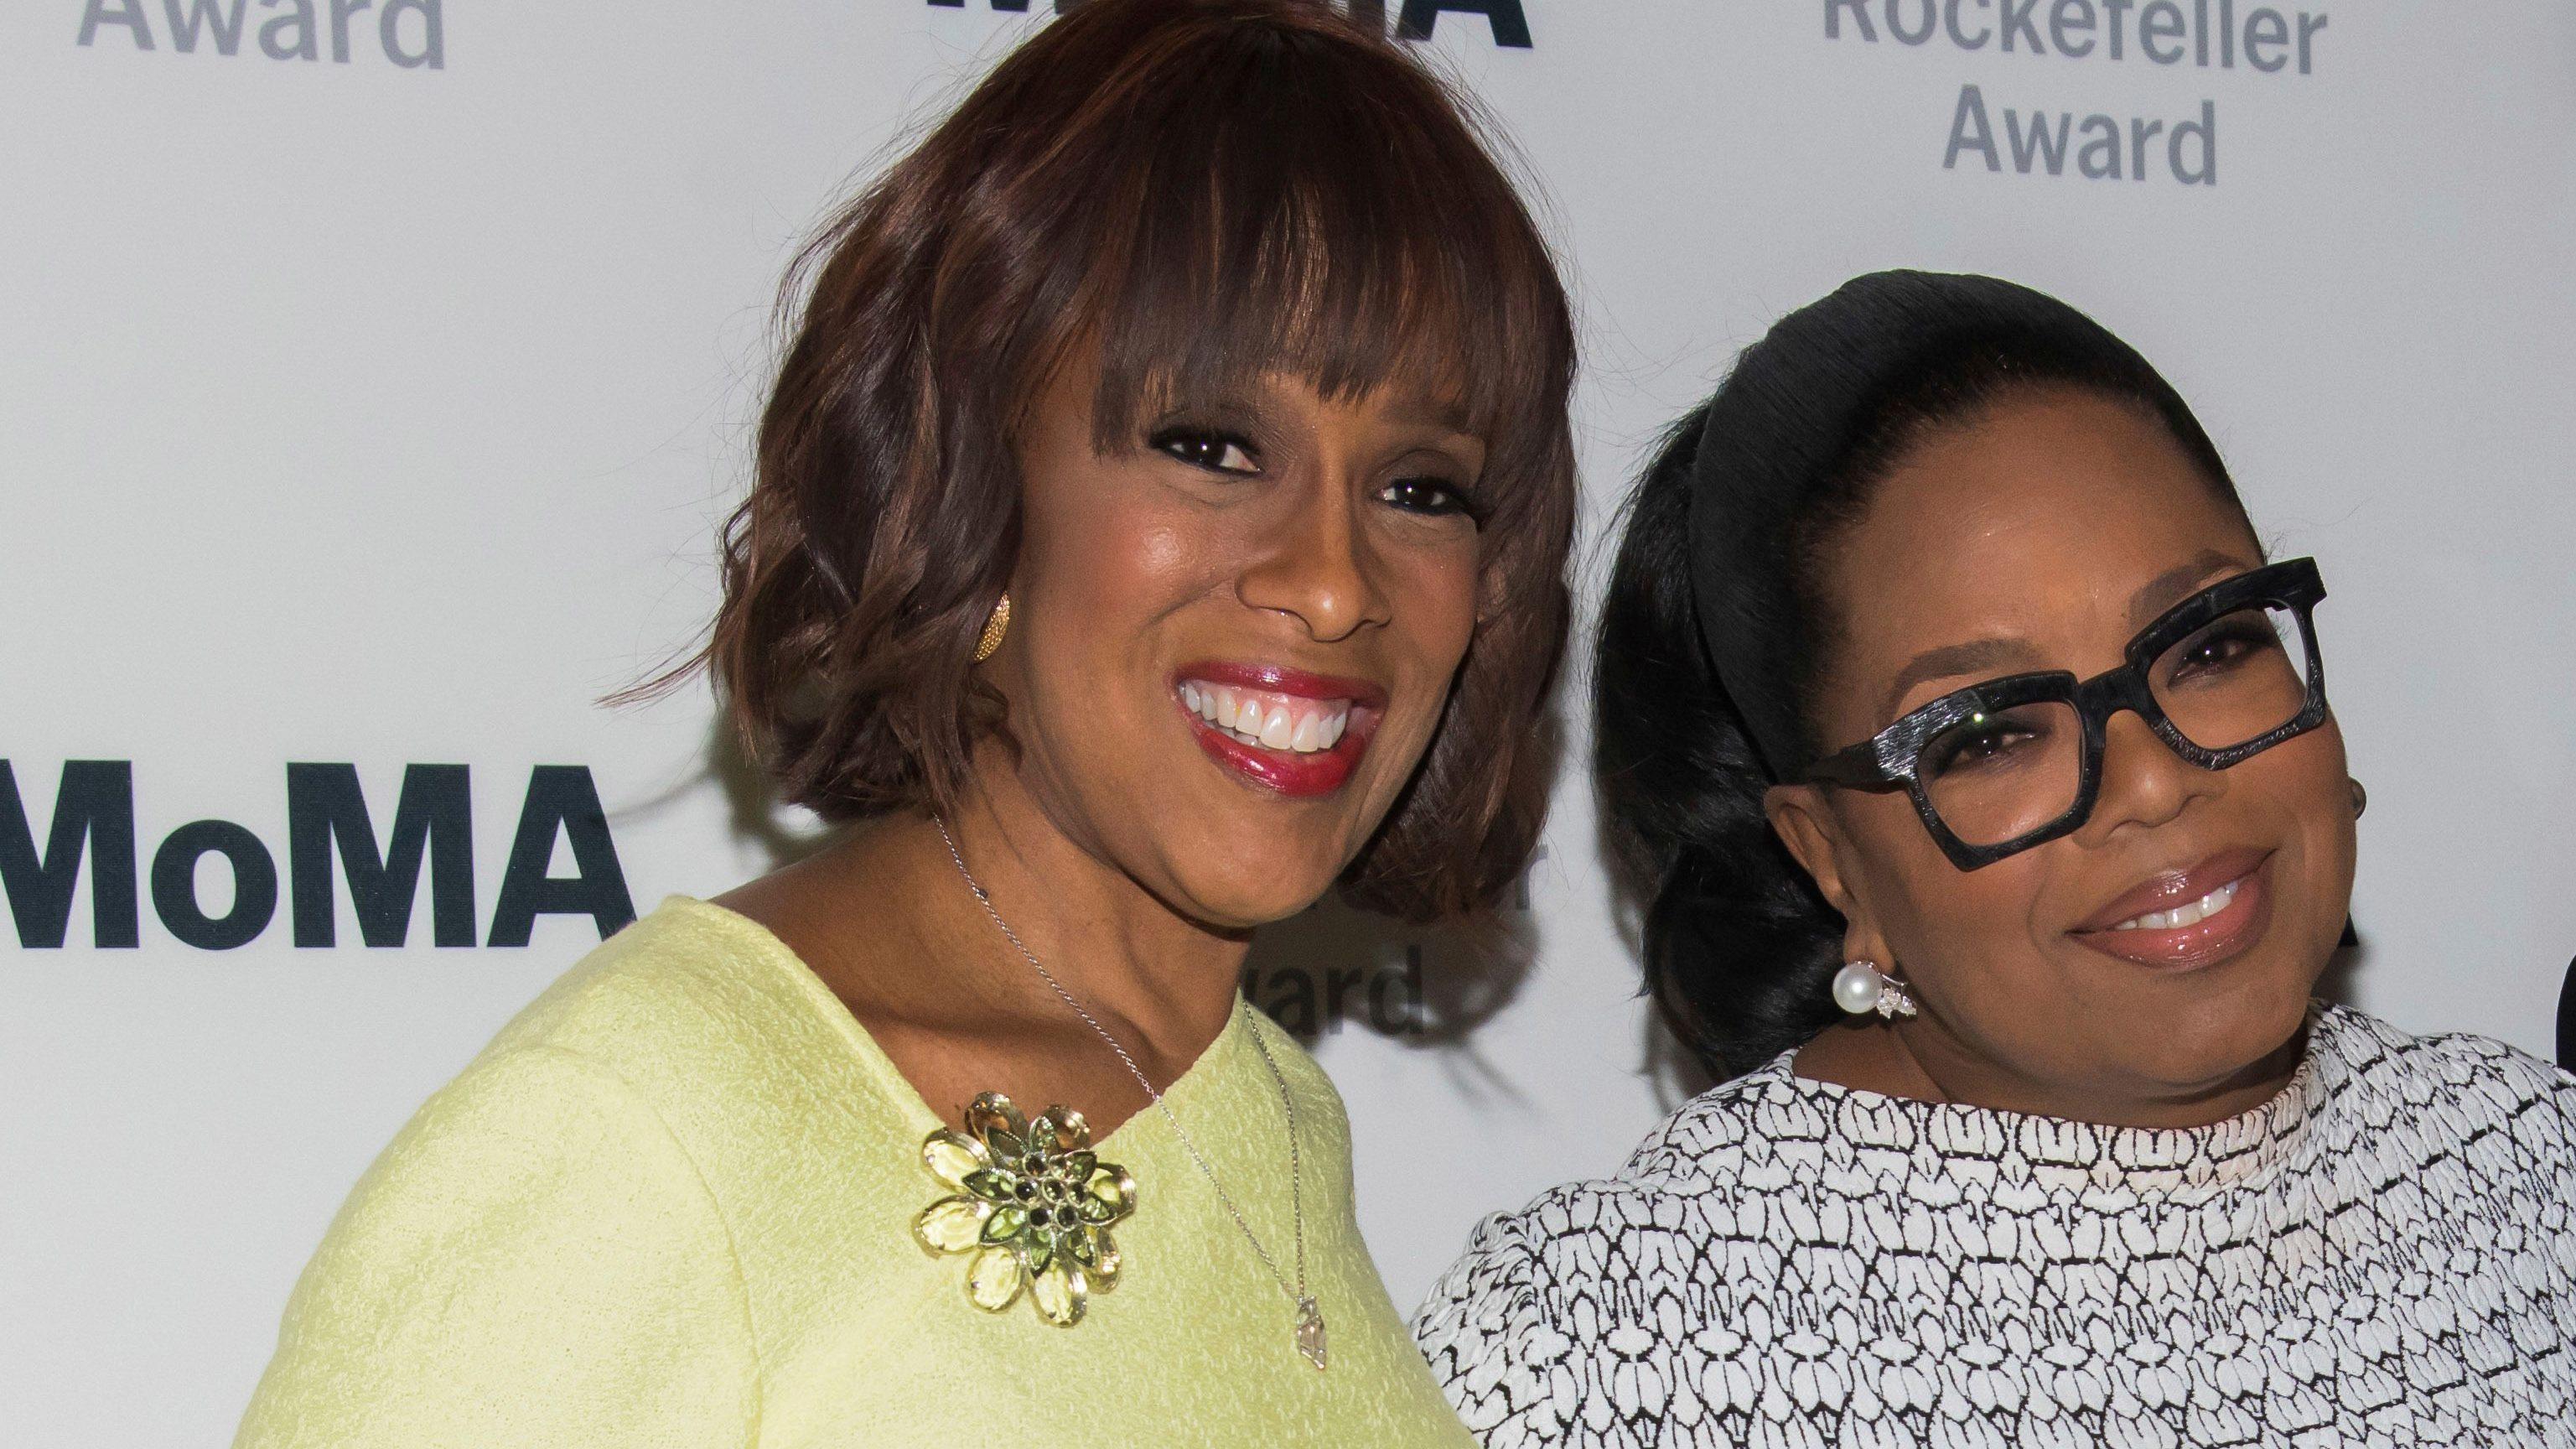 Gayle King, left, and Oprah Winfrey attend The Museum of Modern Art's David Rockefeller Award Luncheon honoring Oprah Winfrey at the Ziegfeld Ballroom on Tuesday, March 6, 2018, in New York.